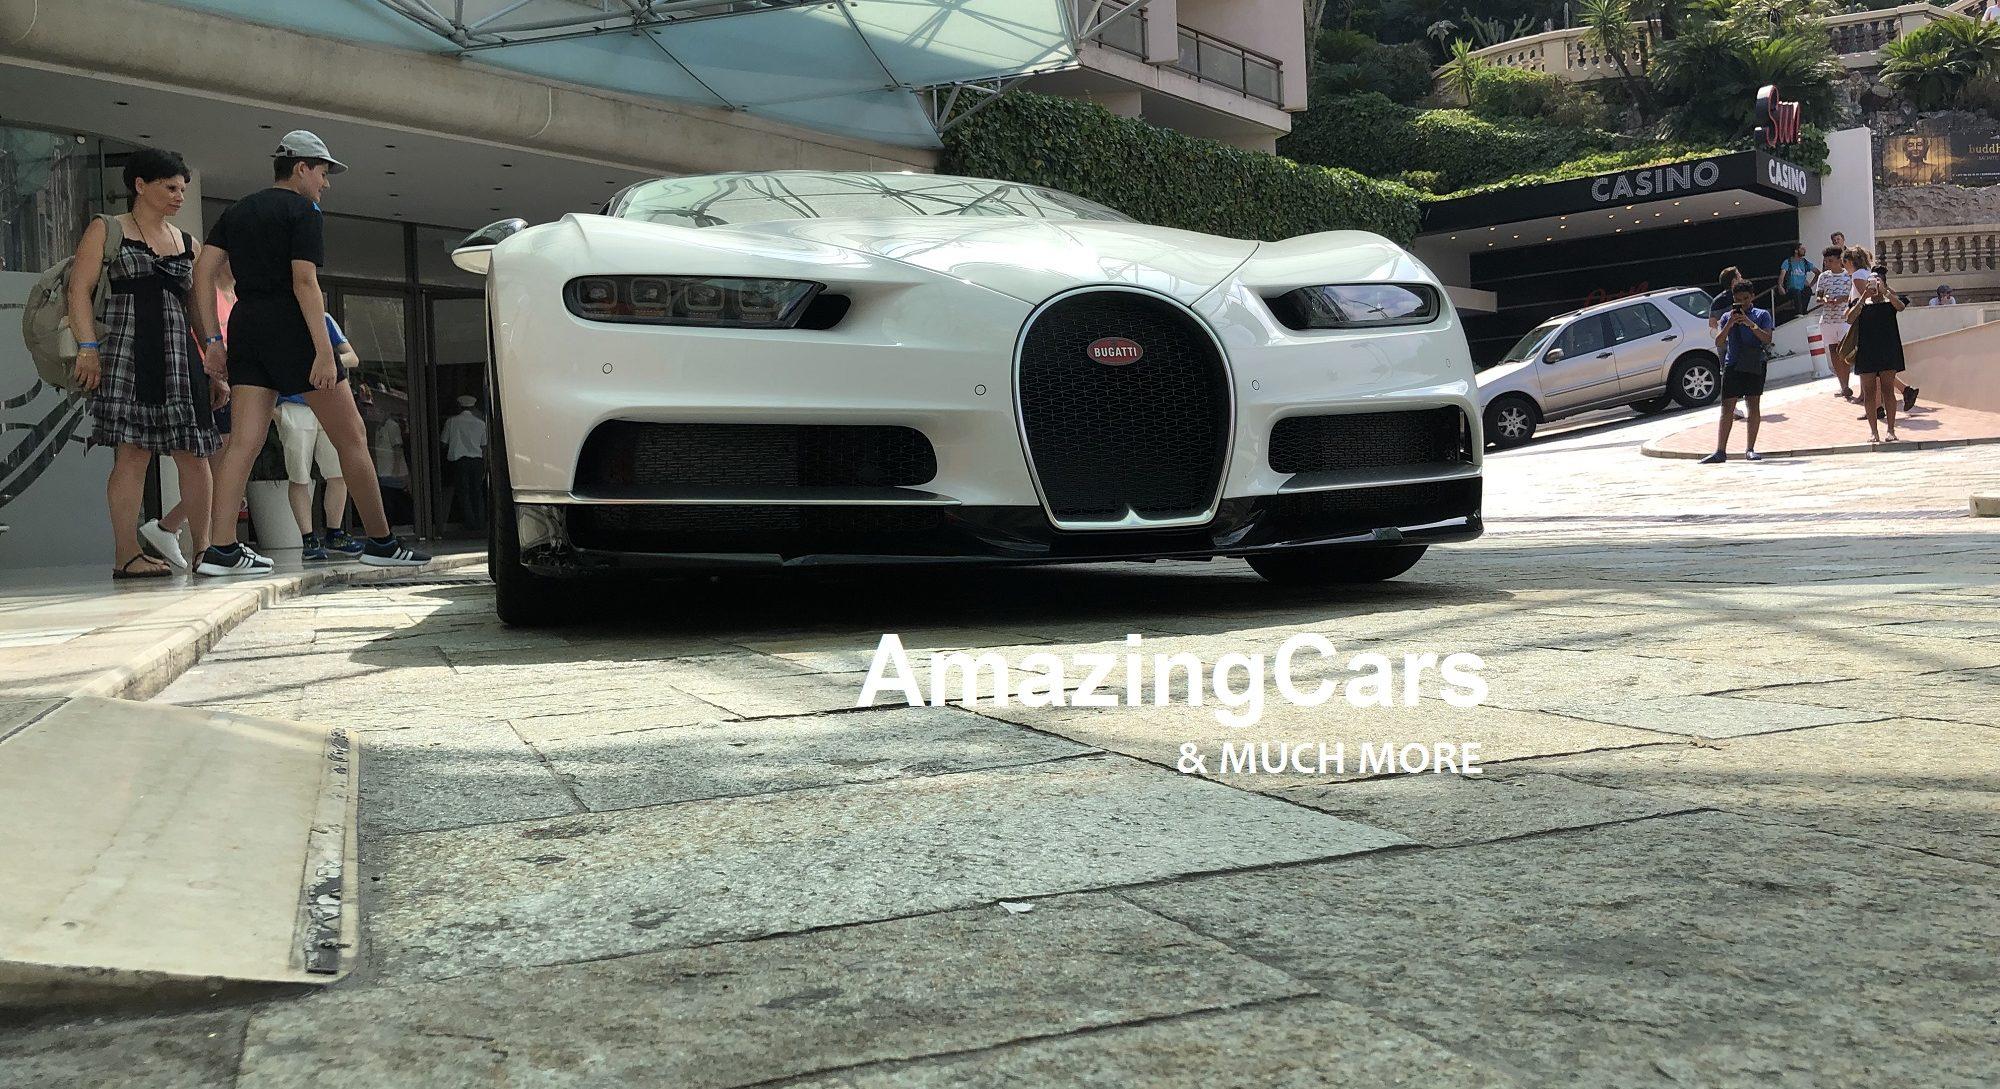 AmazingCars.dk